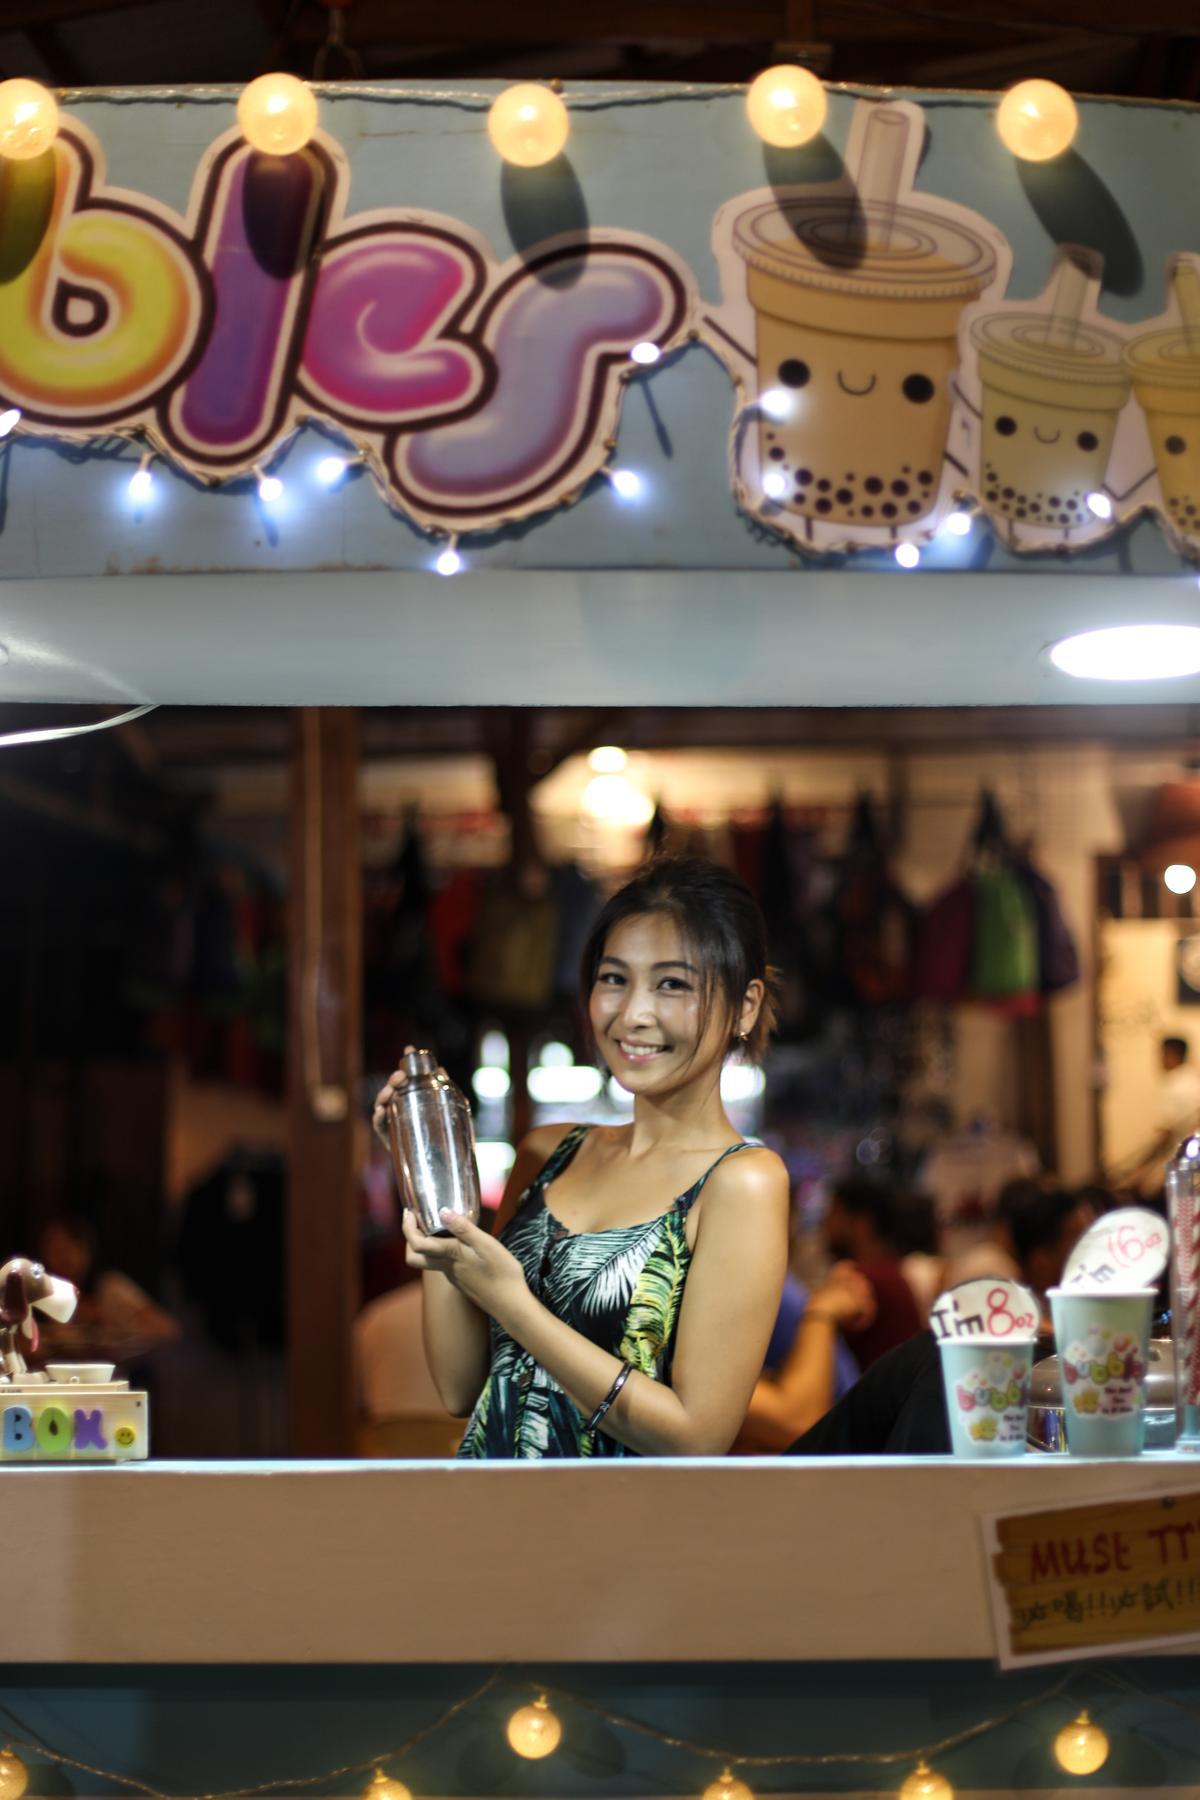 Sylvia開的珍珠奶茶小攤,就開在愛妮島鎮上。